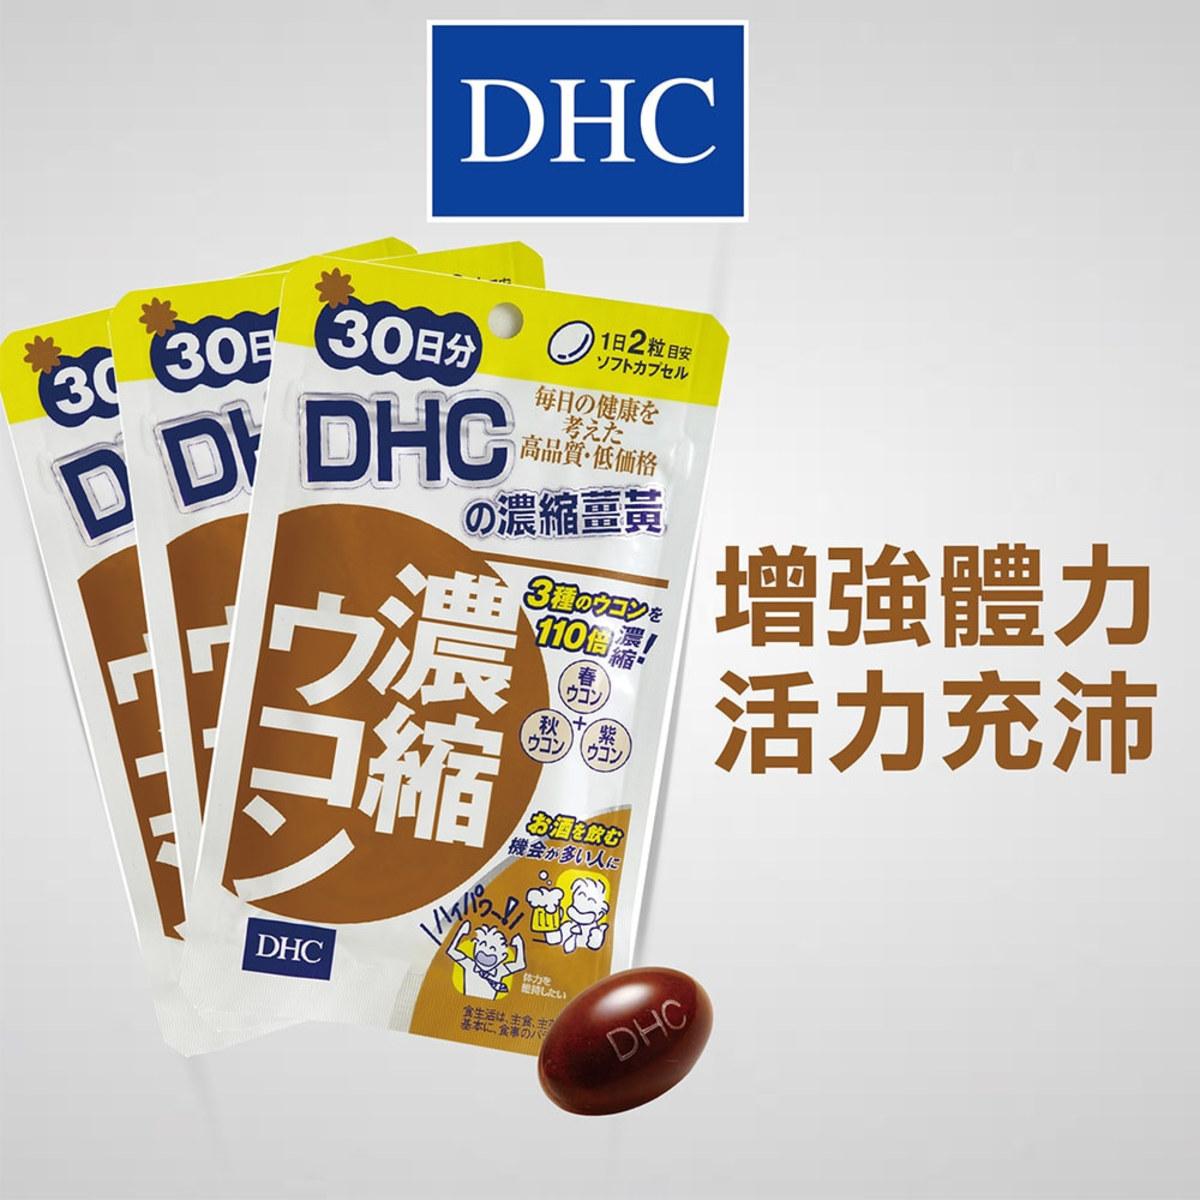 DHC 濃縮薑黃 180粒 (60 粒 X 3 包)